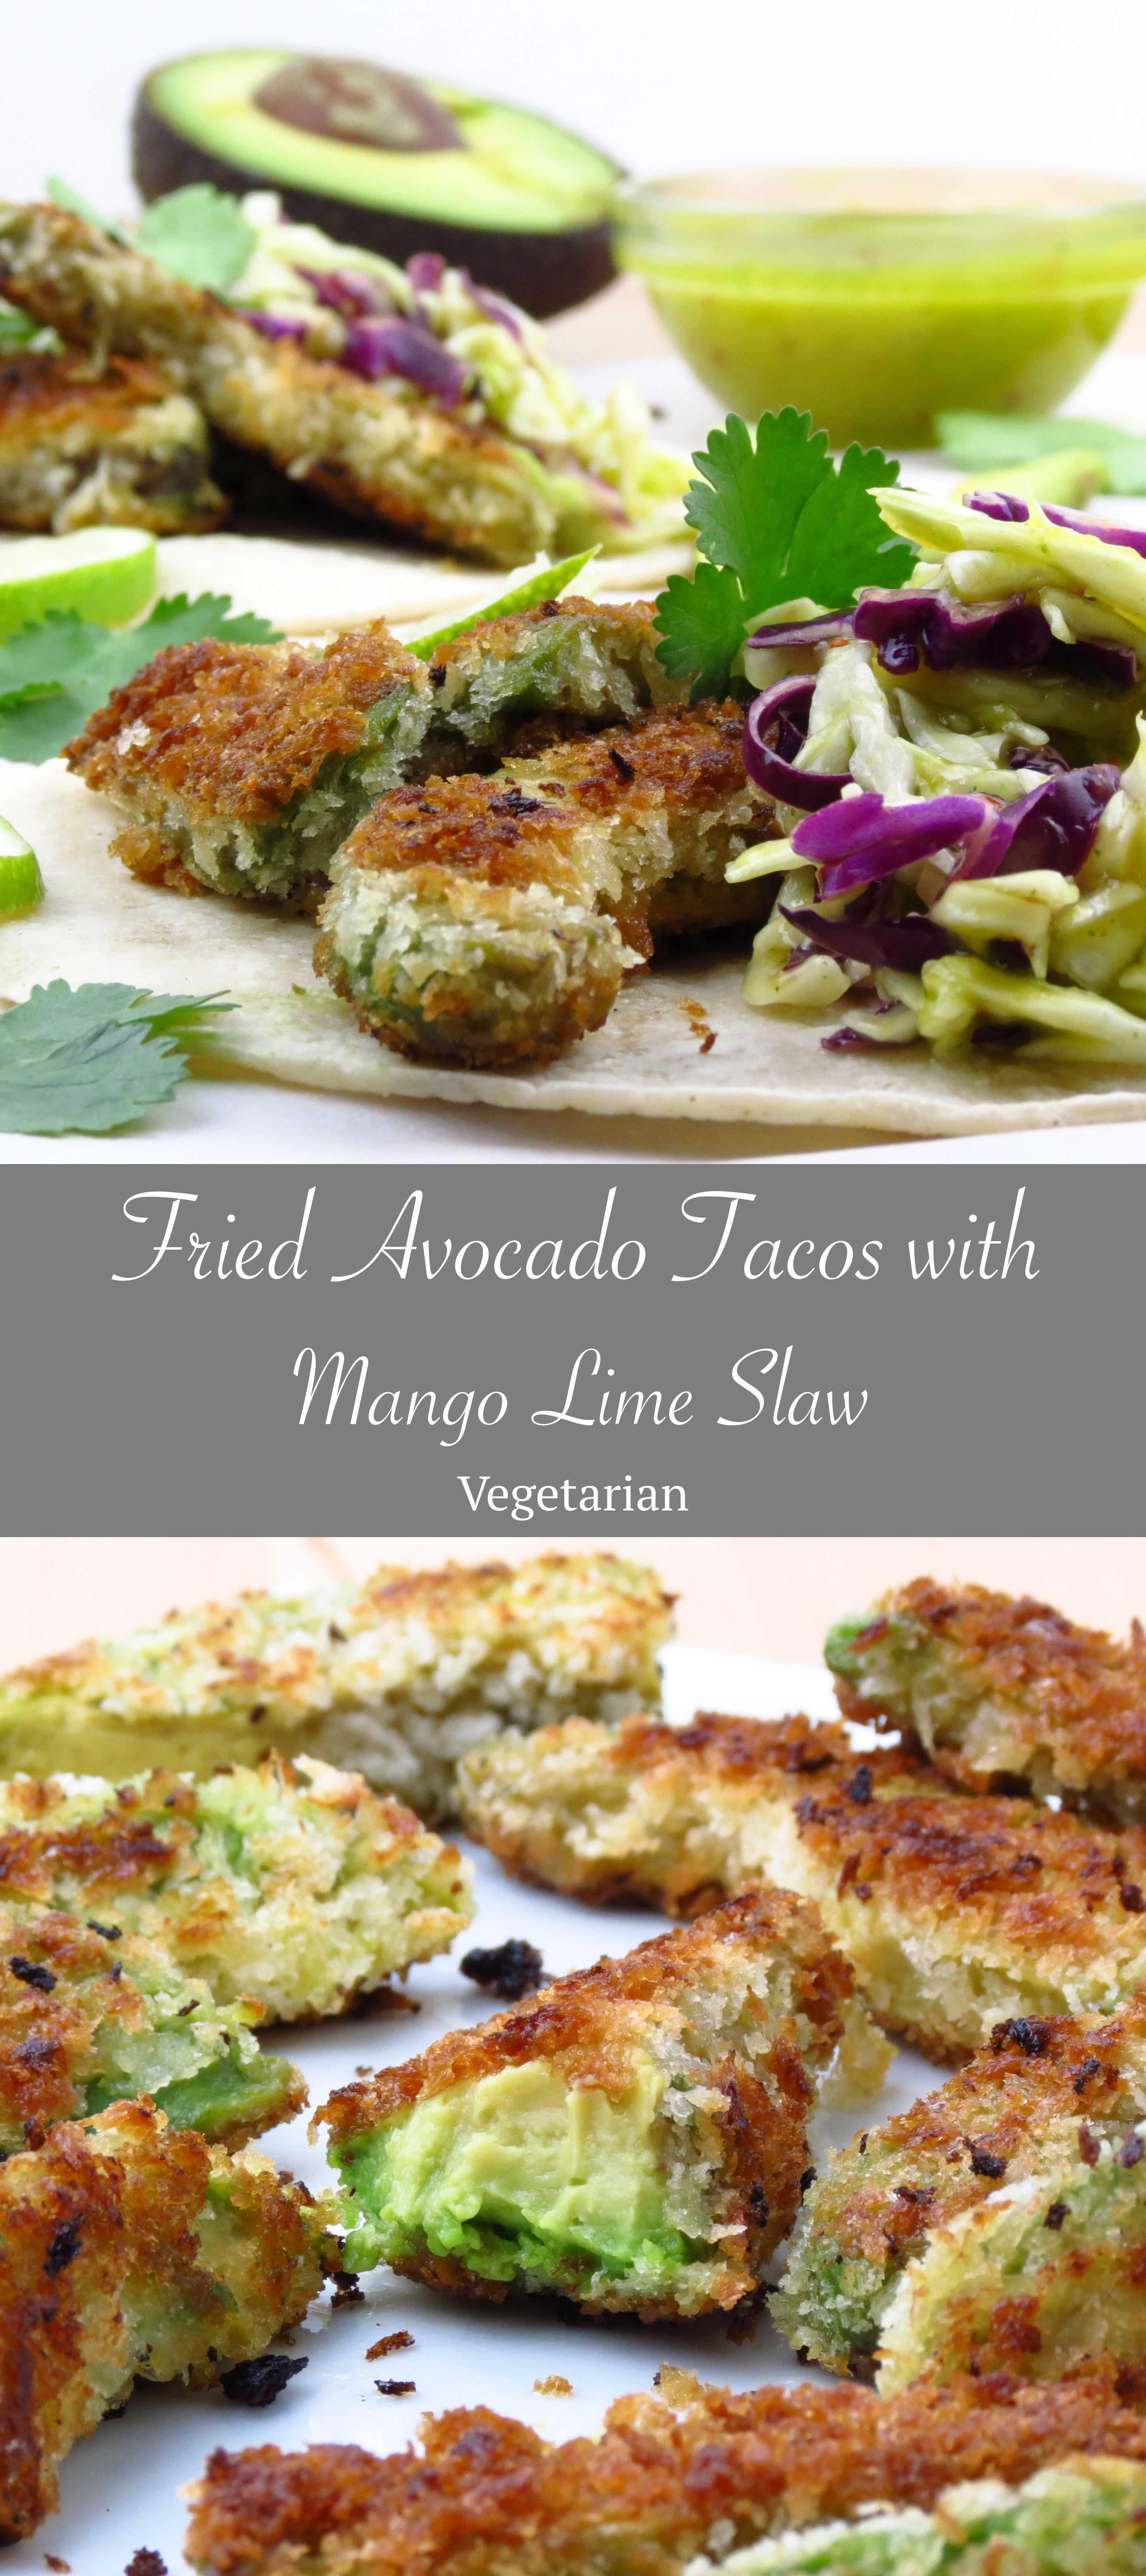 Fried Avocado Tacos with Mango Lime Slaw